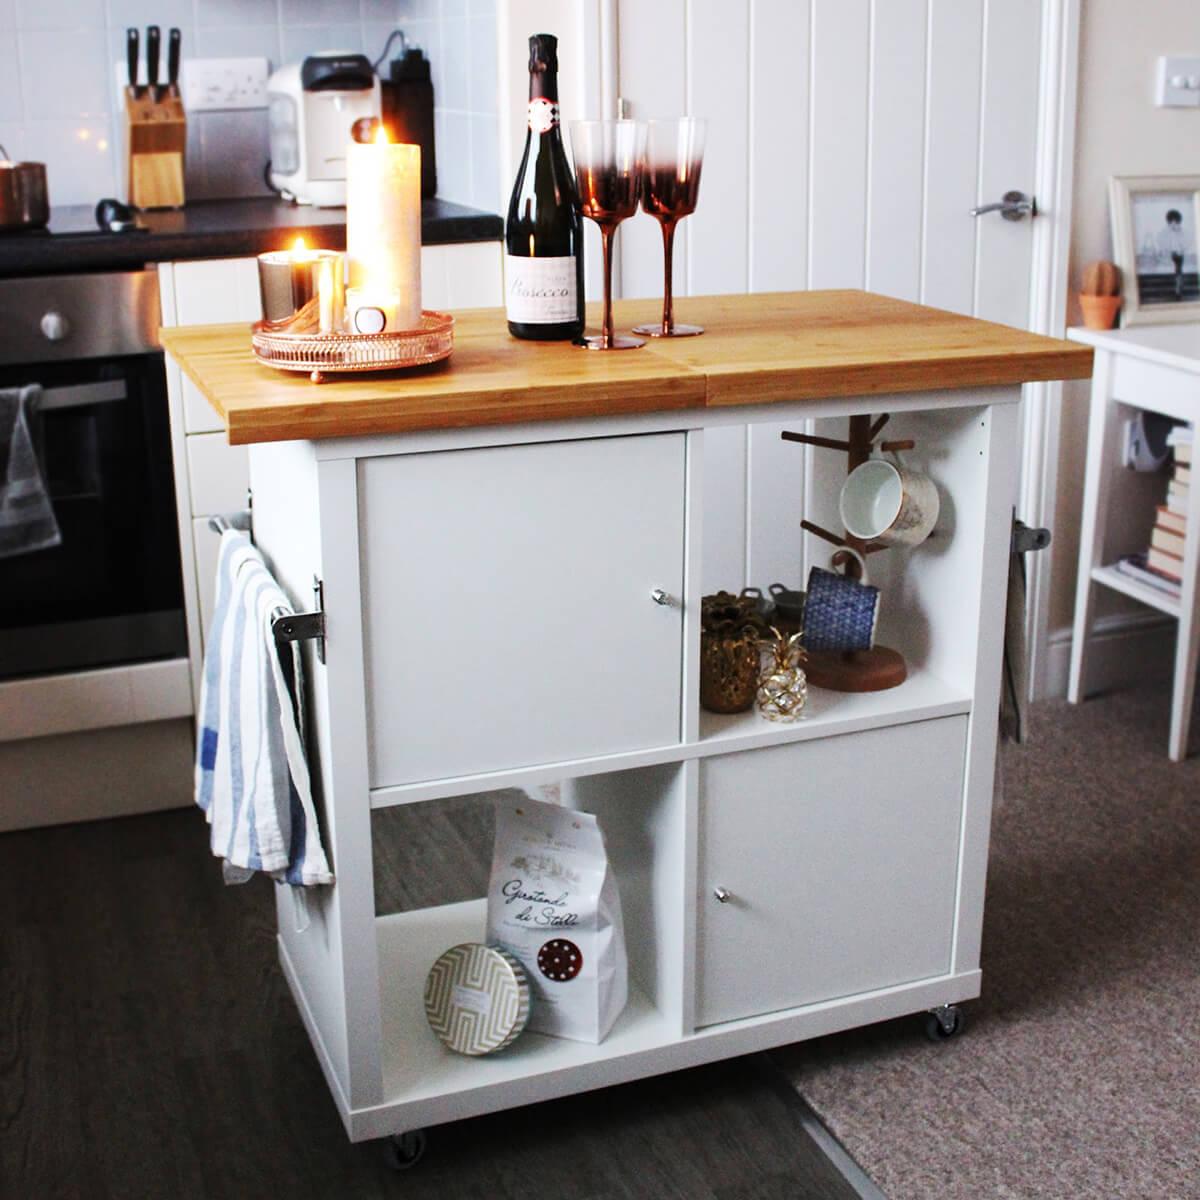 DIY Kitchen Island on Wheels